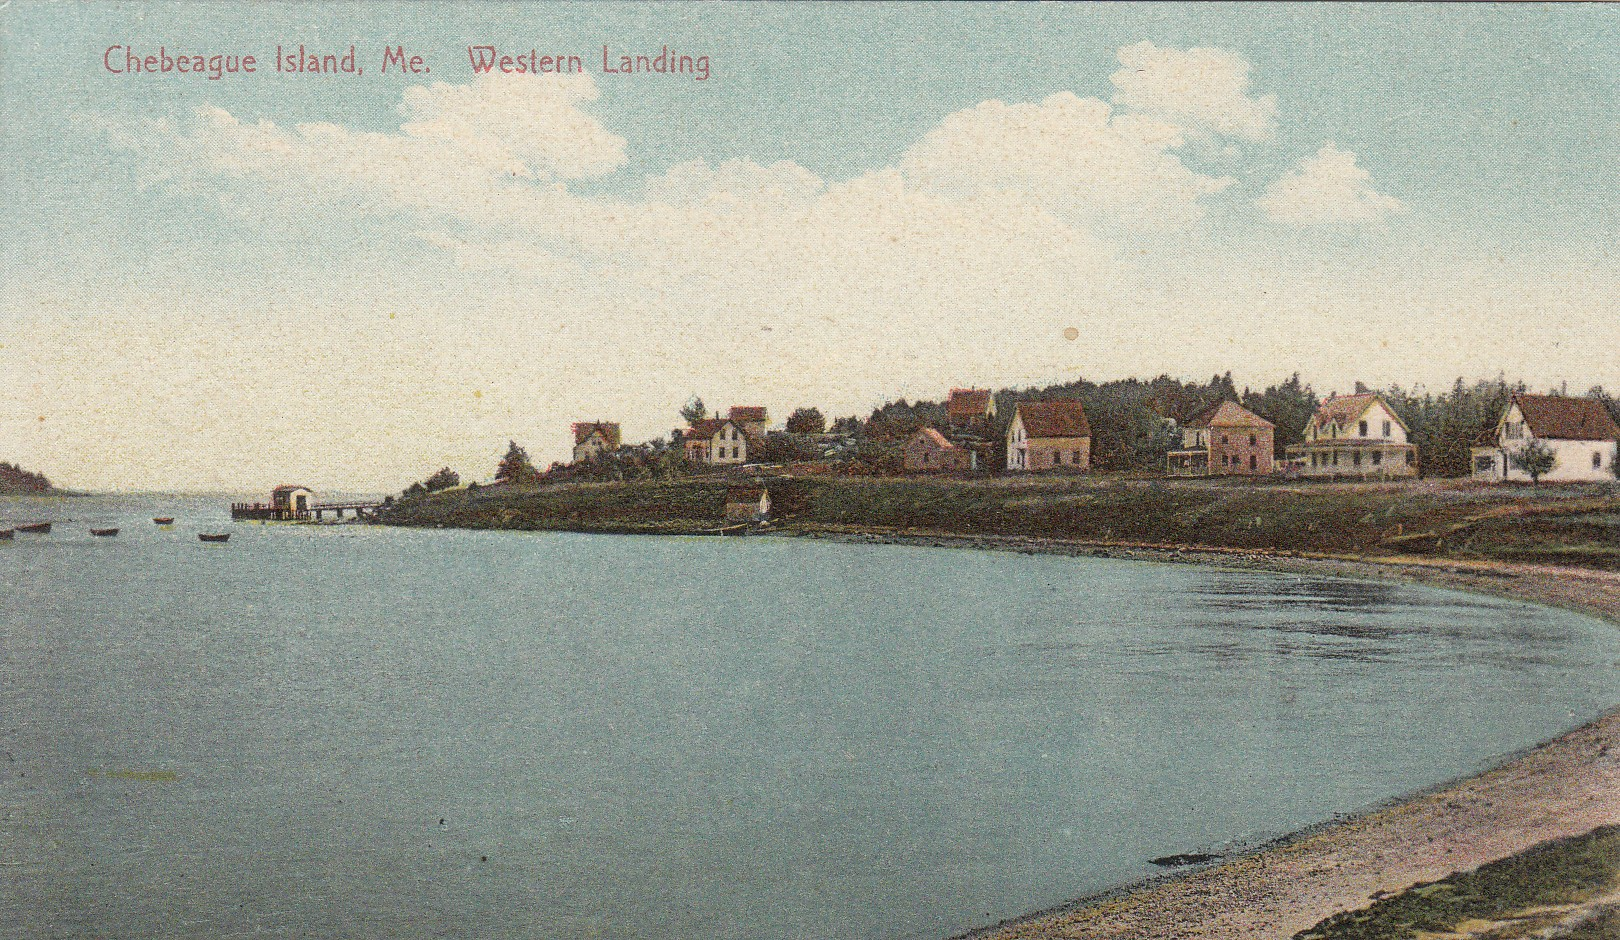 Western Landing